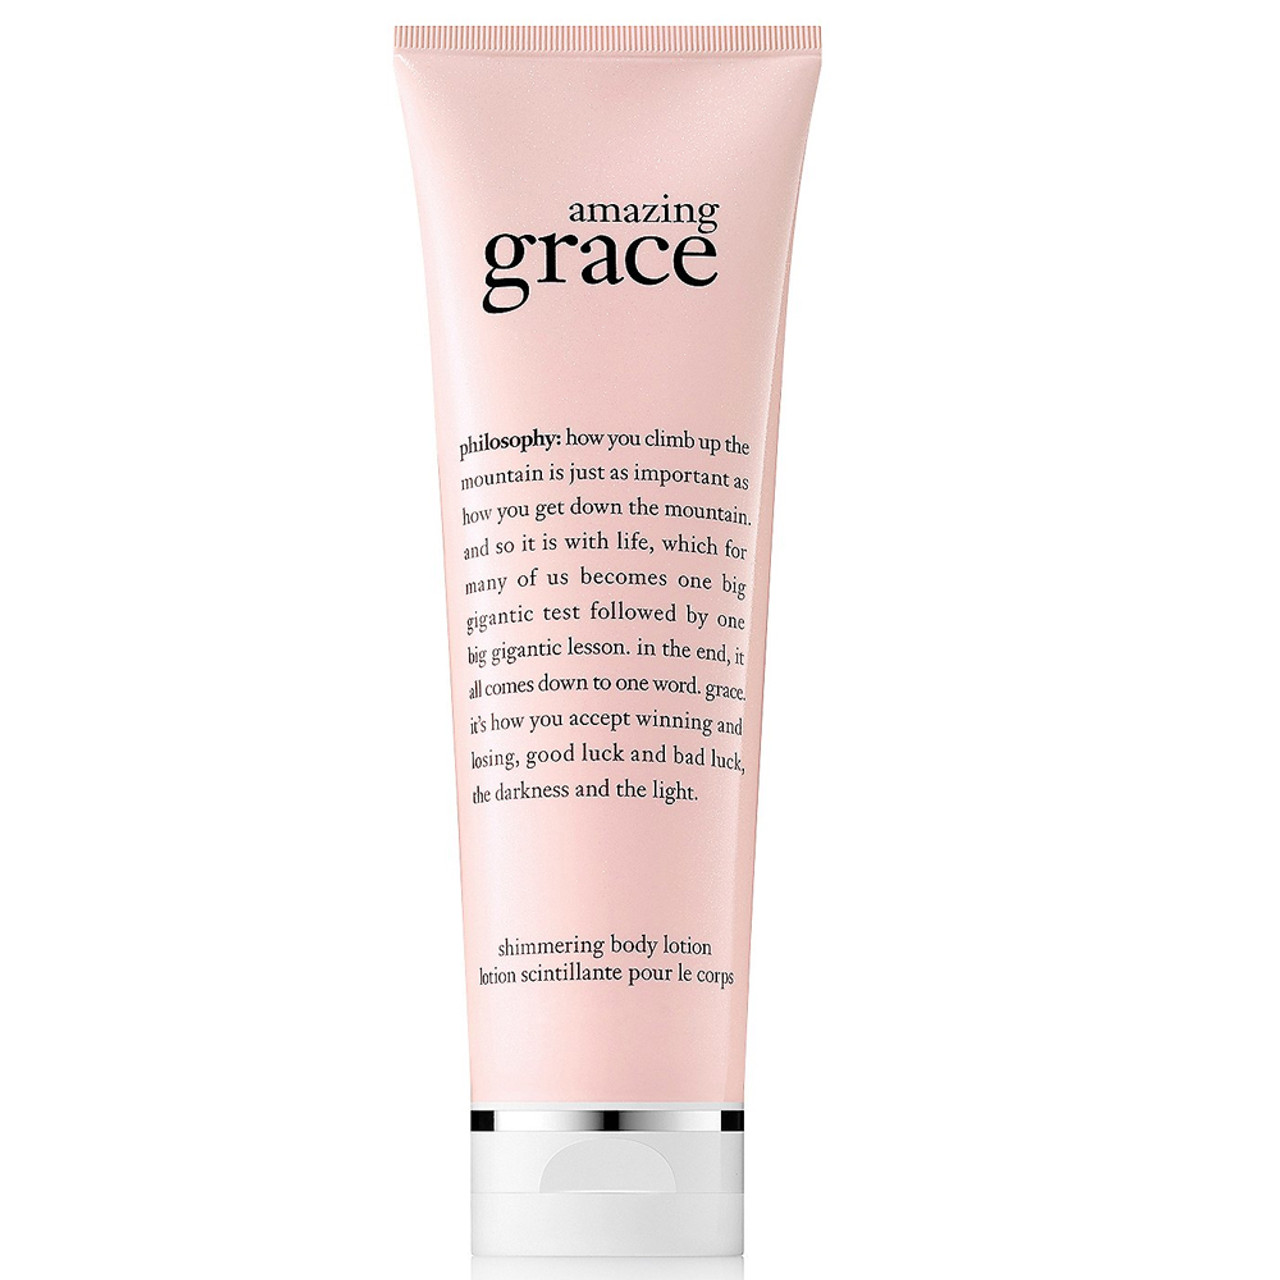 philosophy Amazing Grace Shimmering Body Lotion